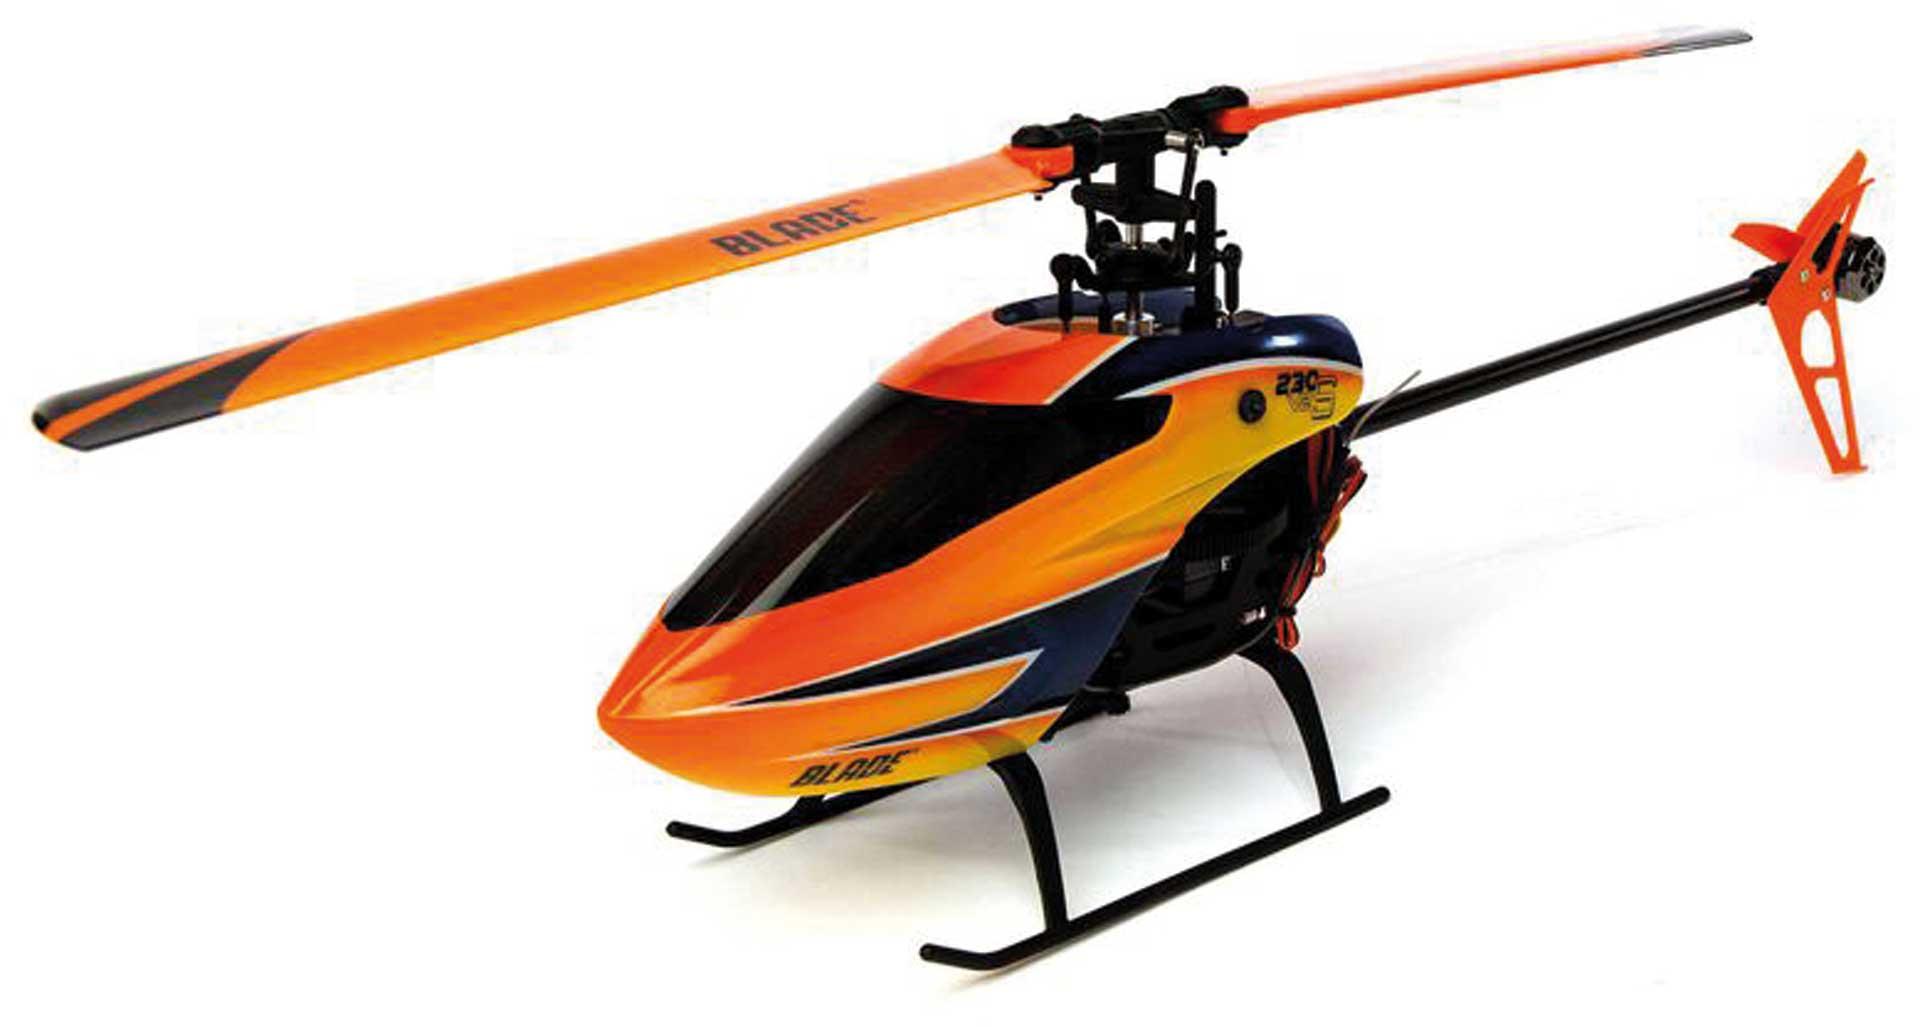 BLADE 230 S Smart BNF Basic Hubschrauber / Helikopter